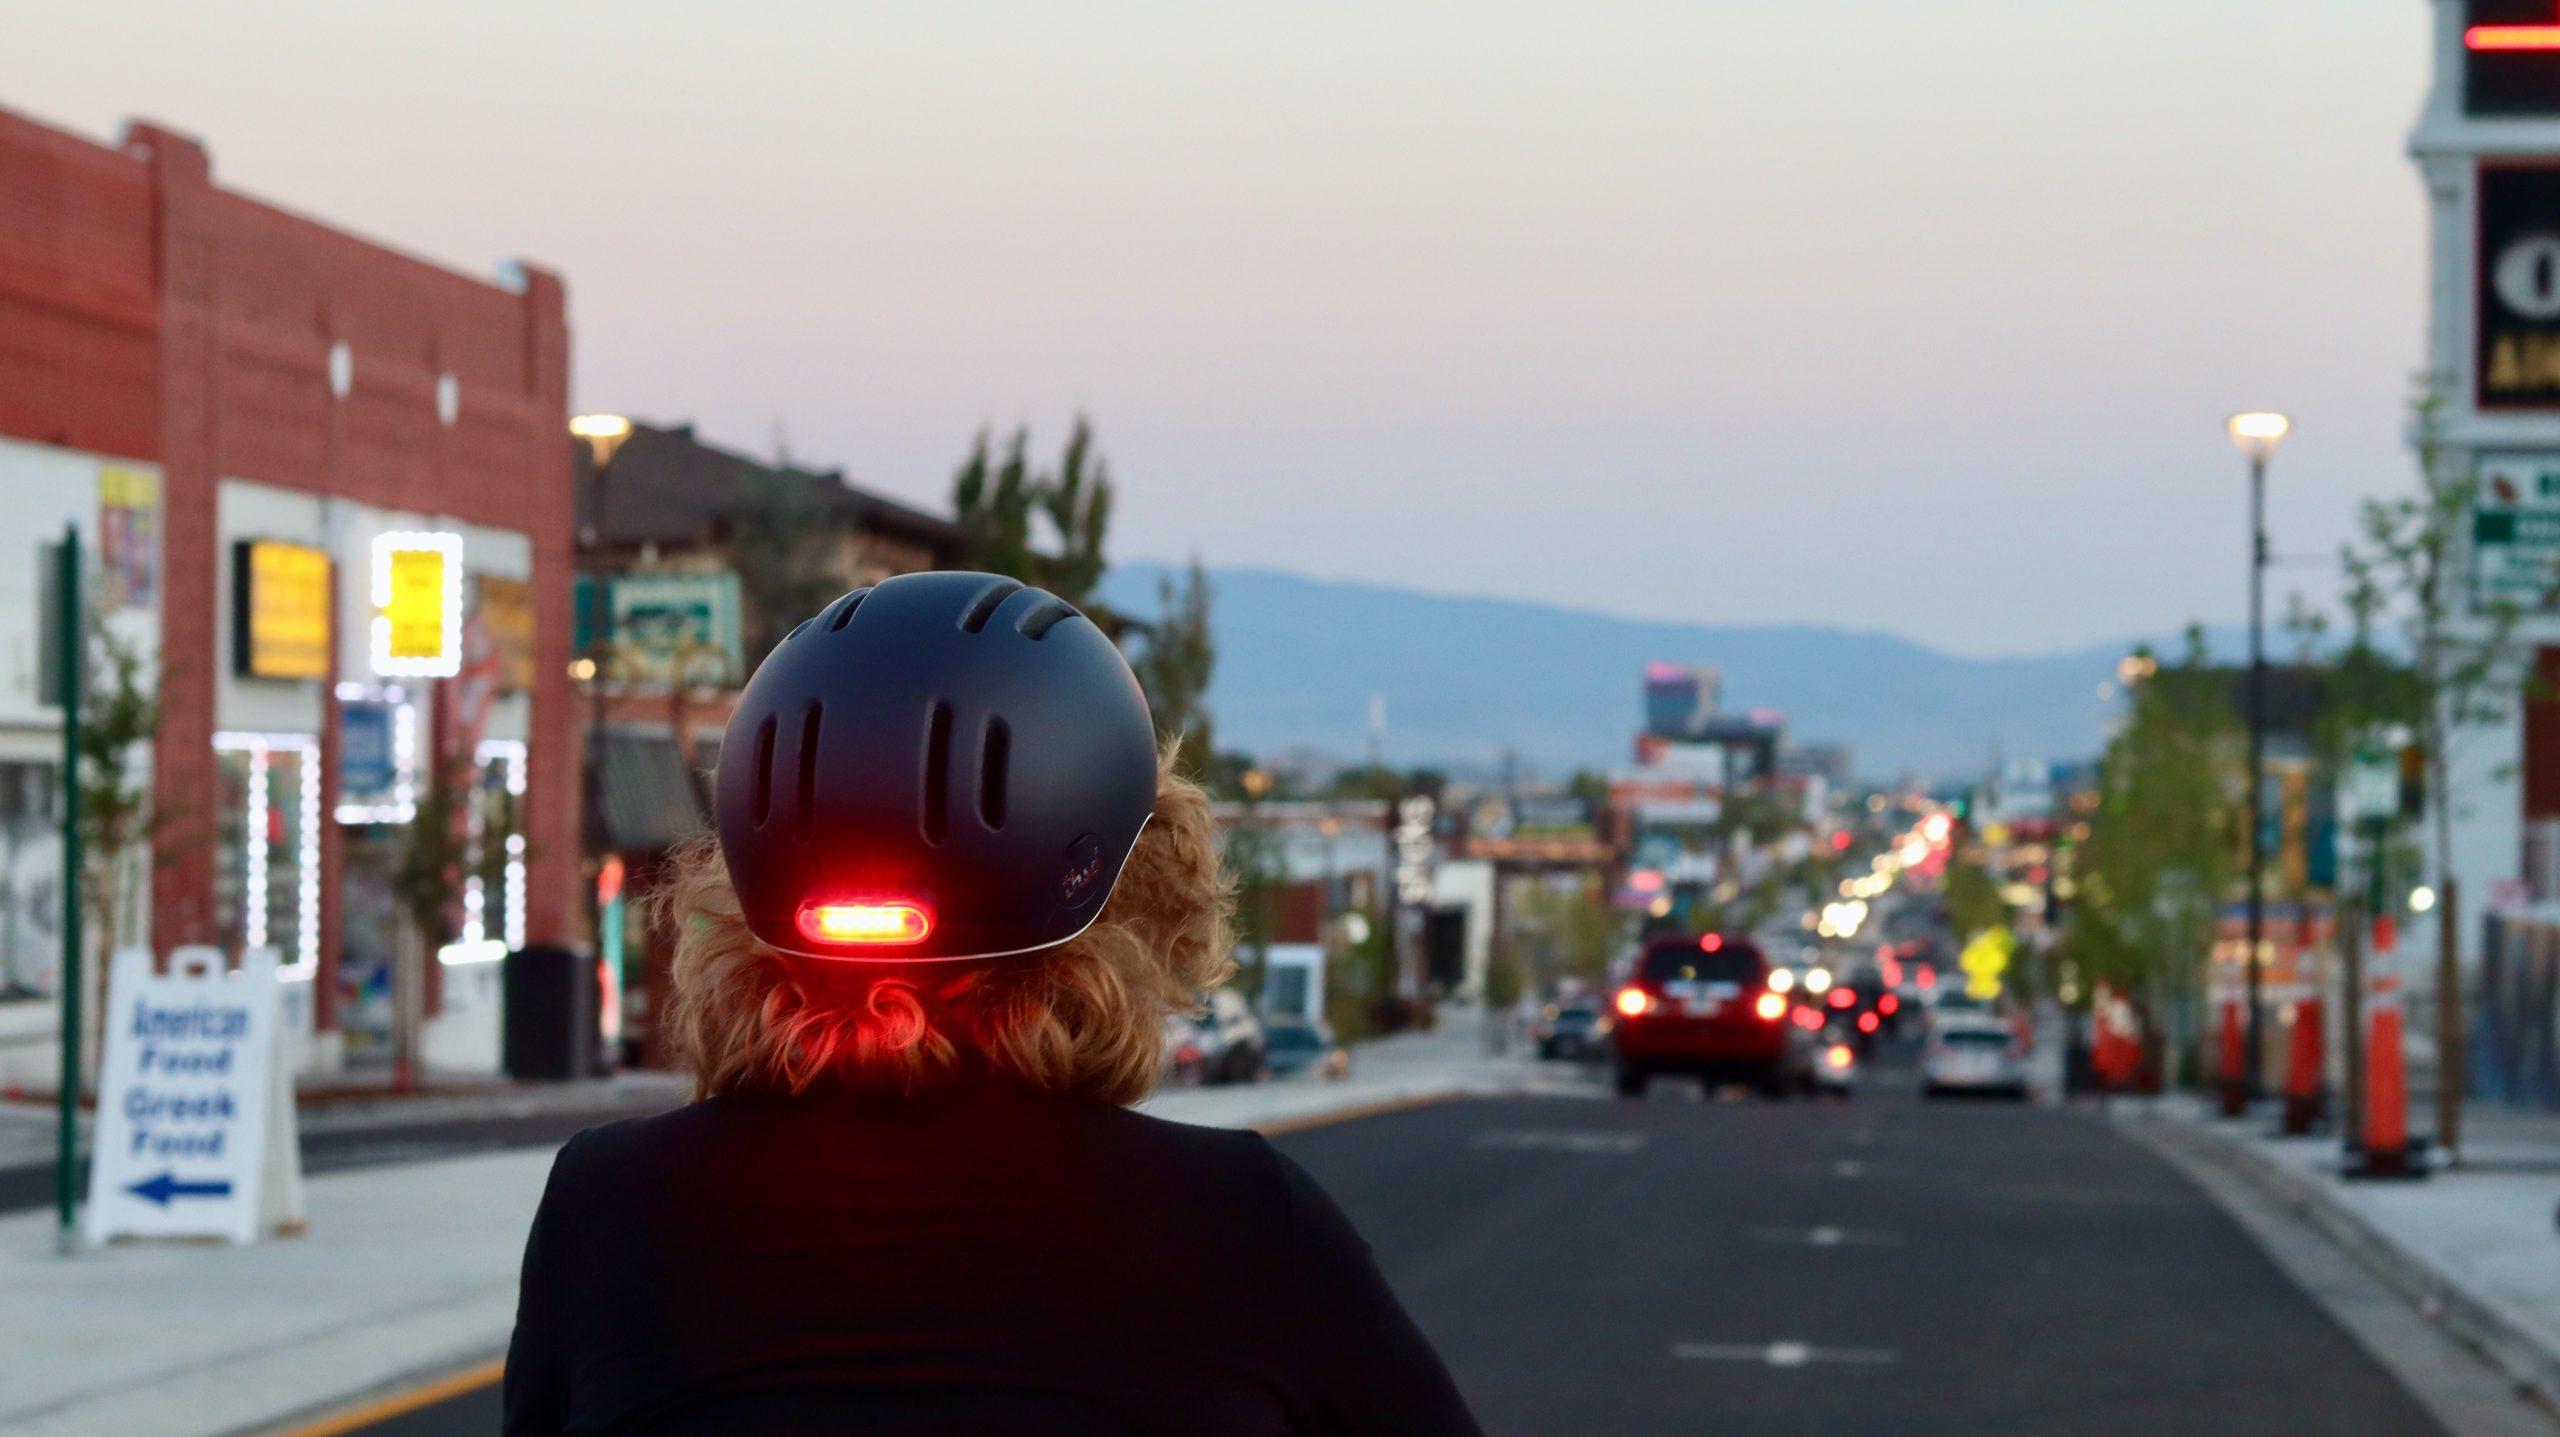 Girl biking with a lit helmet